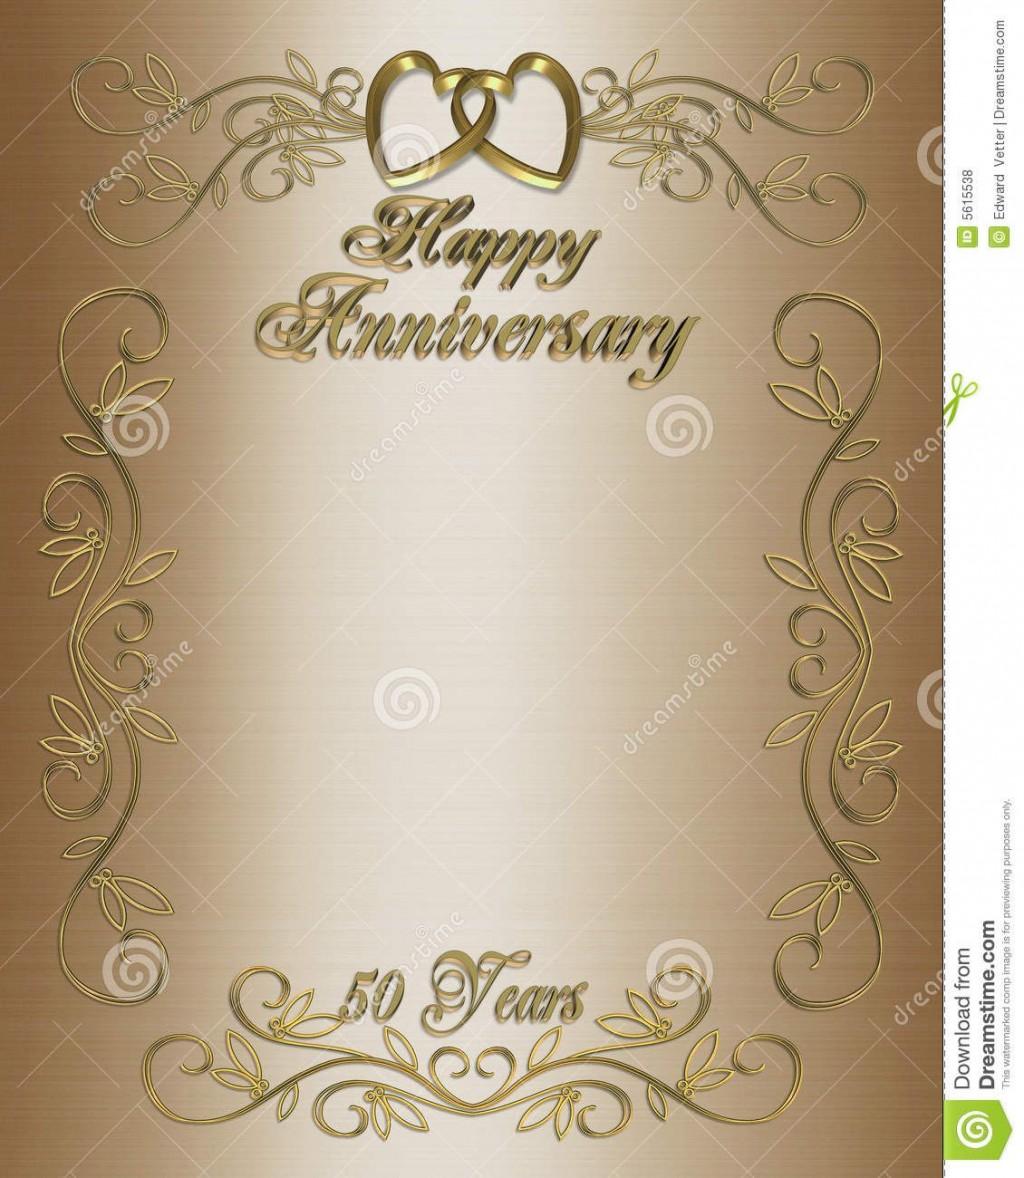 001 Astounding 50th Wedding Anniversary Invitation Design Inspiration  Designs Wording Sample Card Template Free DownloadLarge